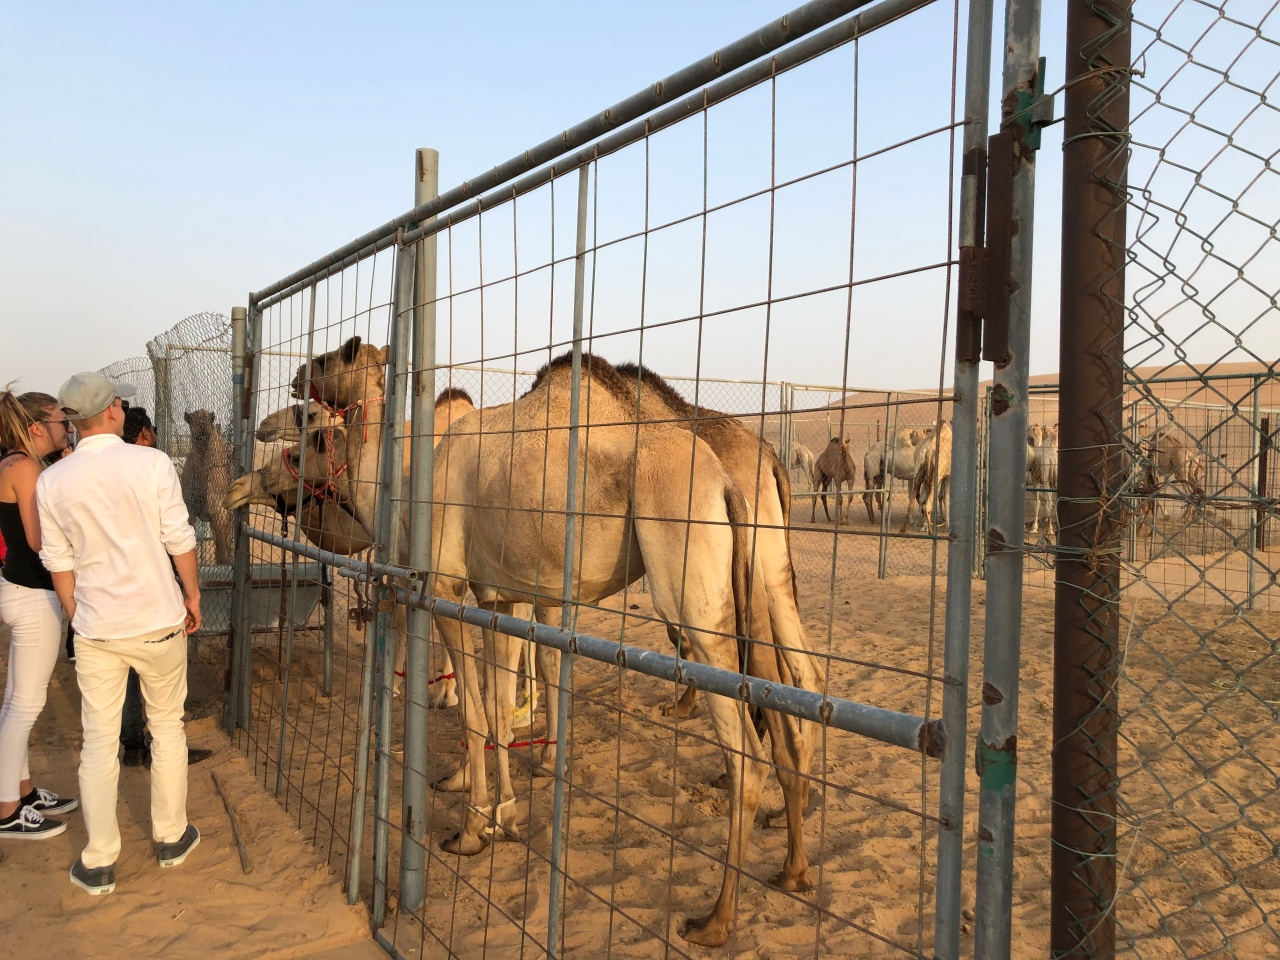 Camel farm Dubai desert